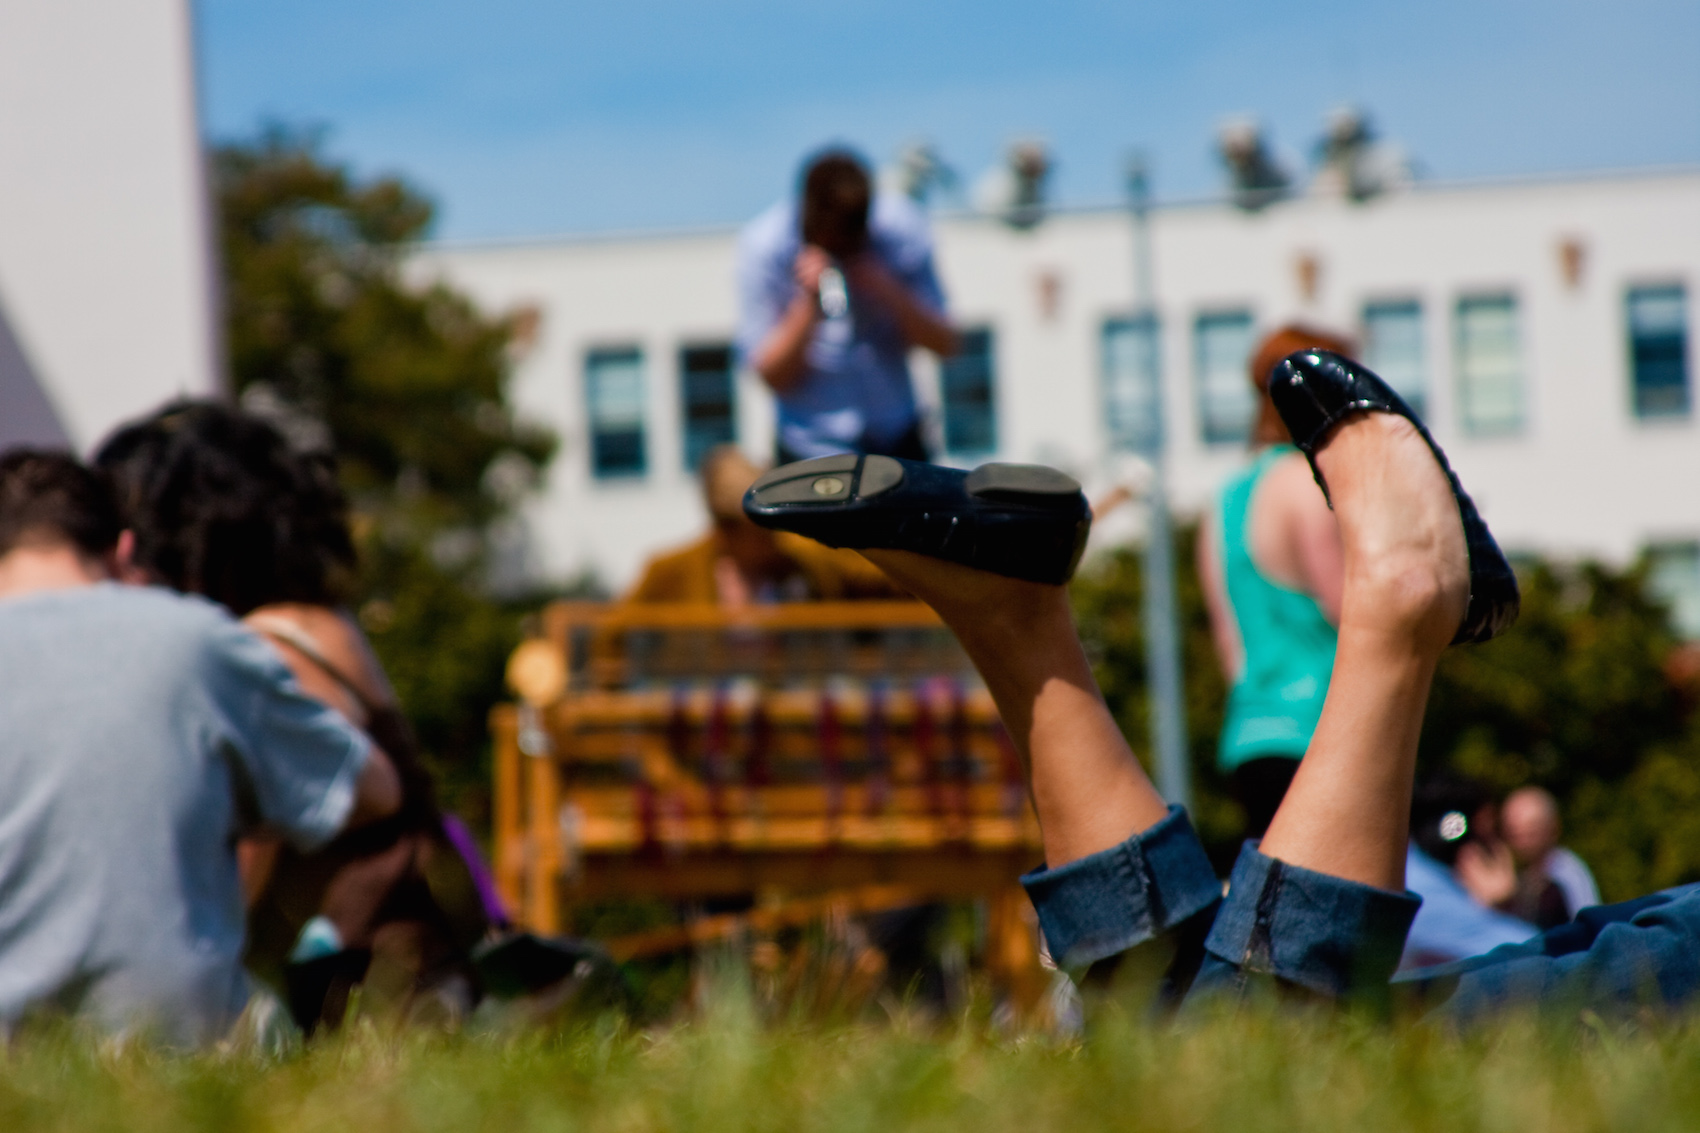 Girl at Delores Park | © Jesse! S?/Flickr